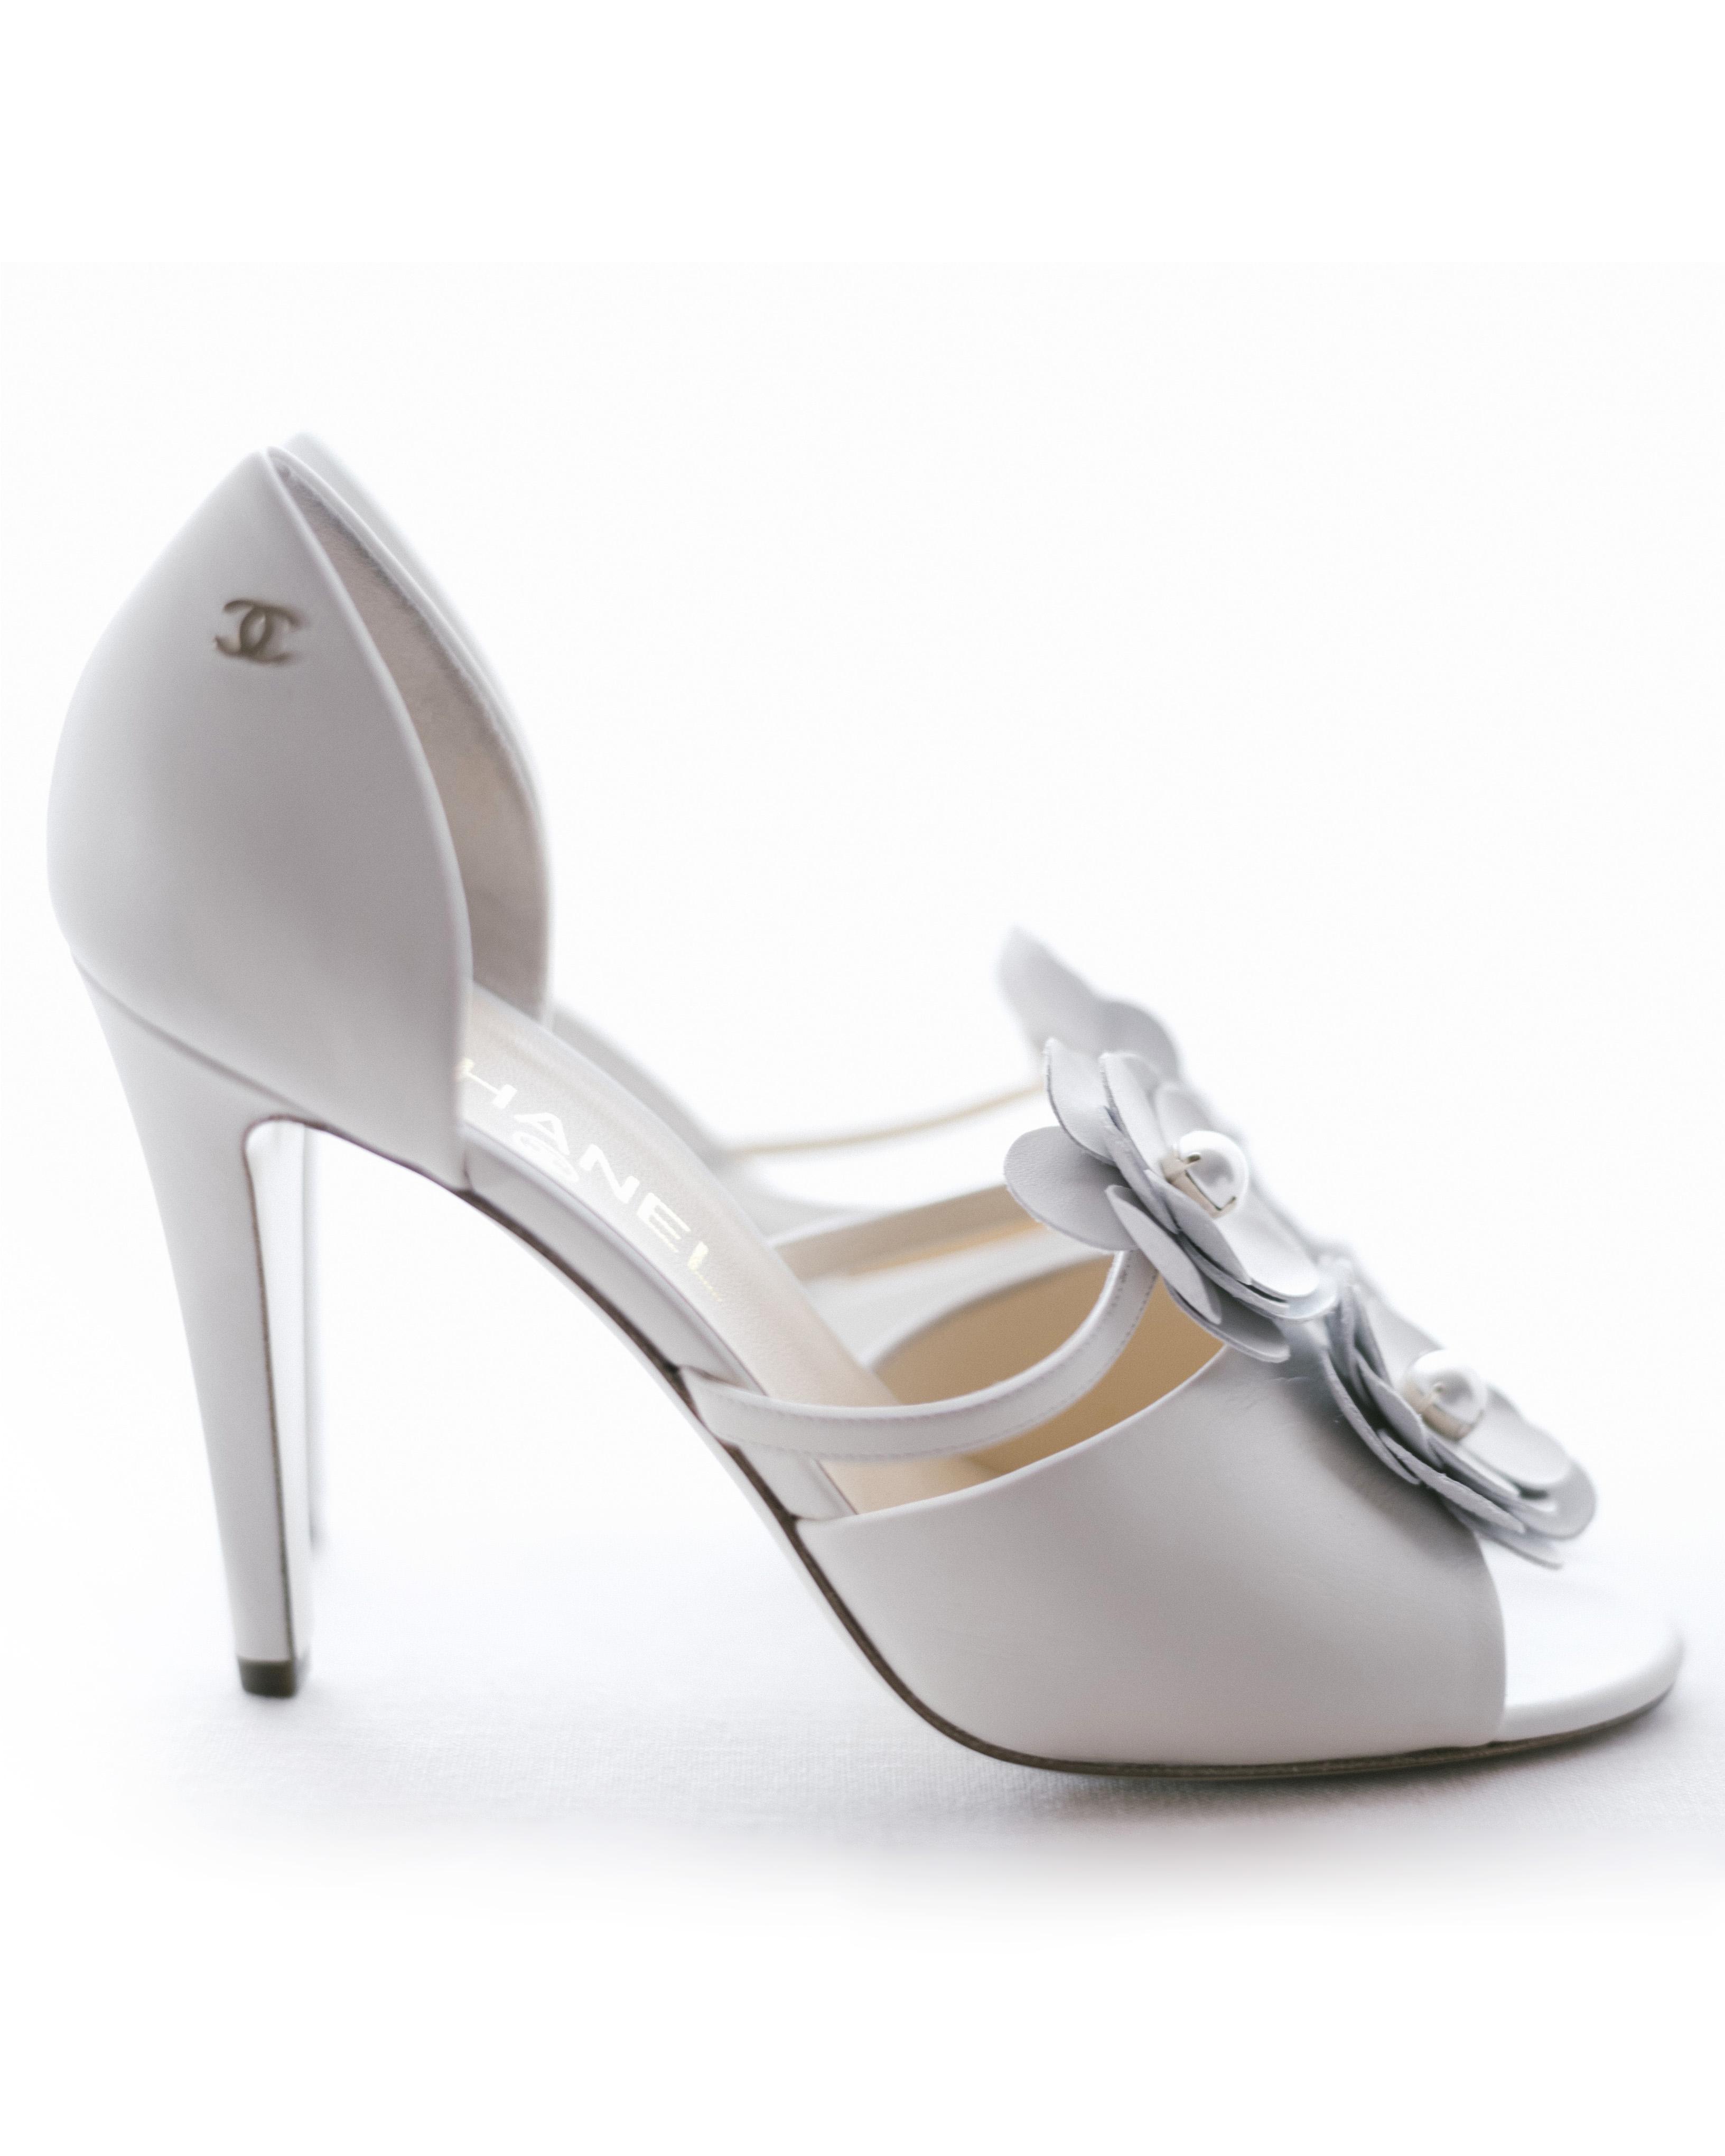 cassandra ben wedding california chanel shoes